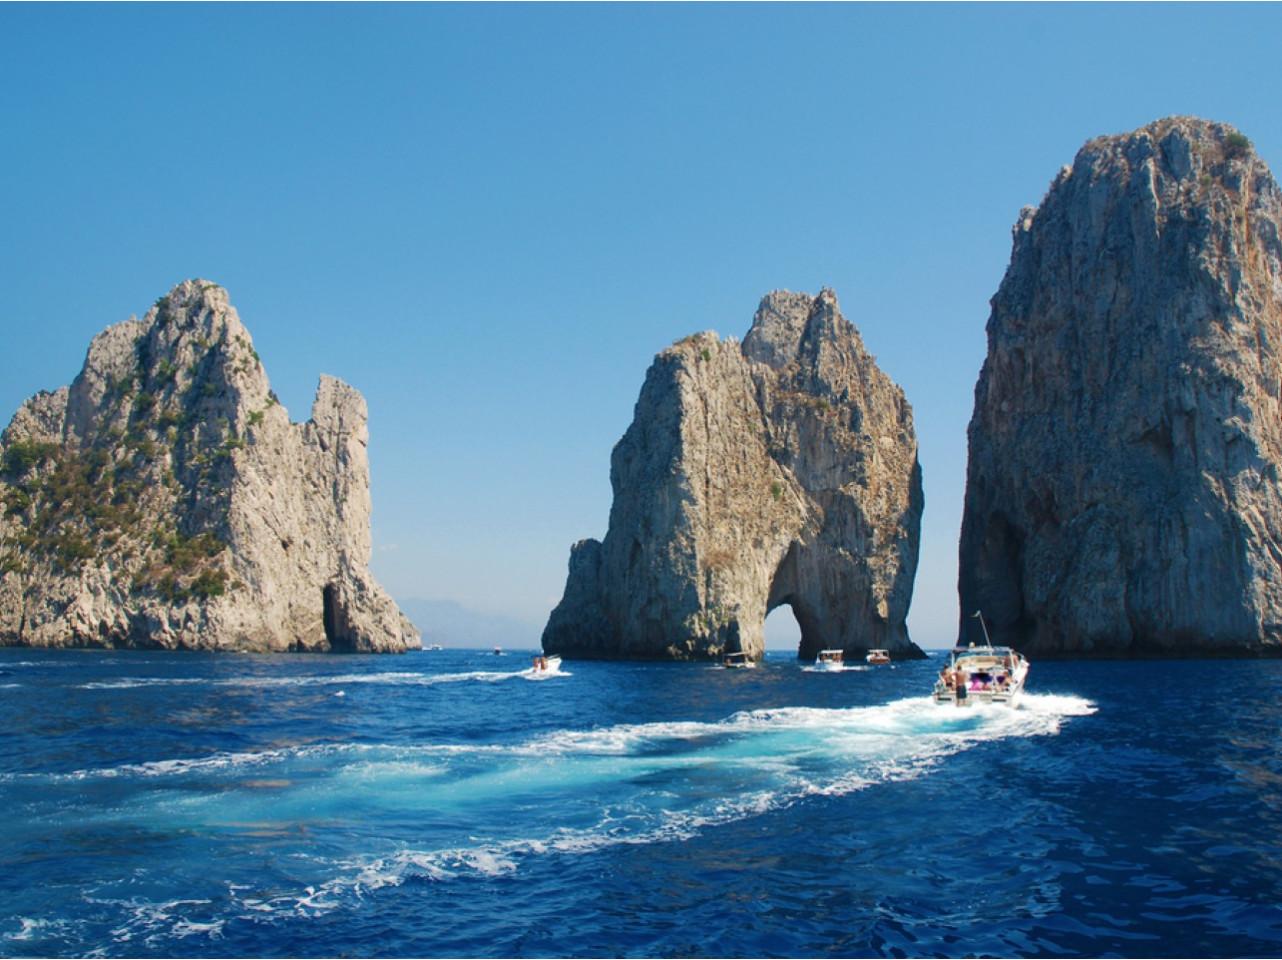 Capri boat tours| Capri boat excursions|Visit Capri by boat